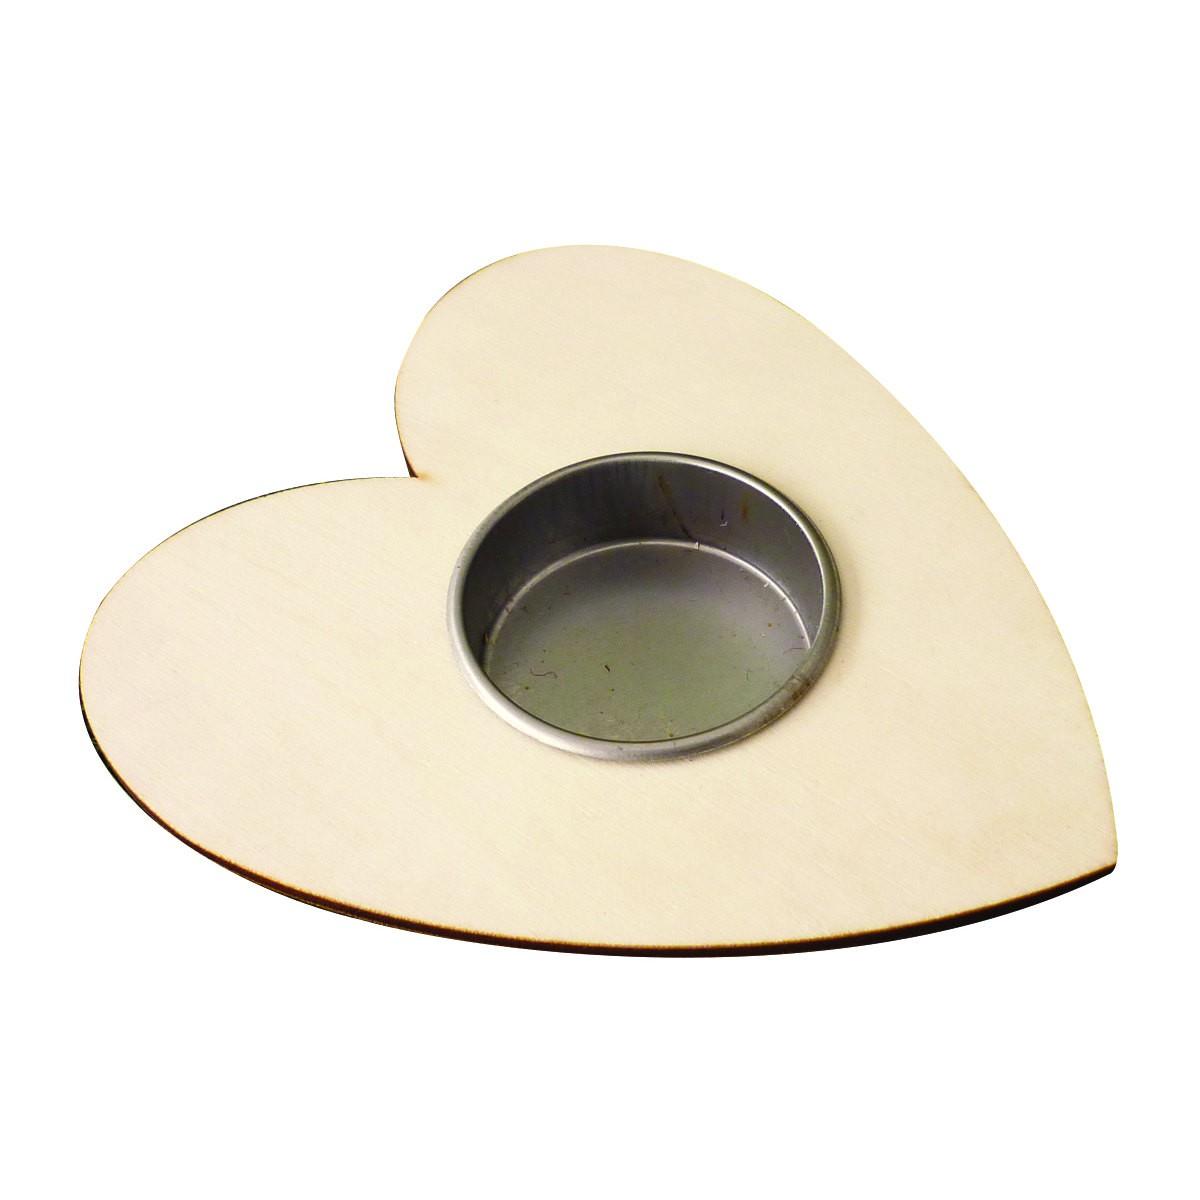 5 supports bougie chauffe plat coeur bougeoir en bois brut d corer 120x100mm h 20mm. Black Bedroom Furniture Sets. Home Design Ideas